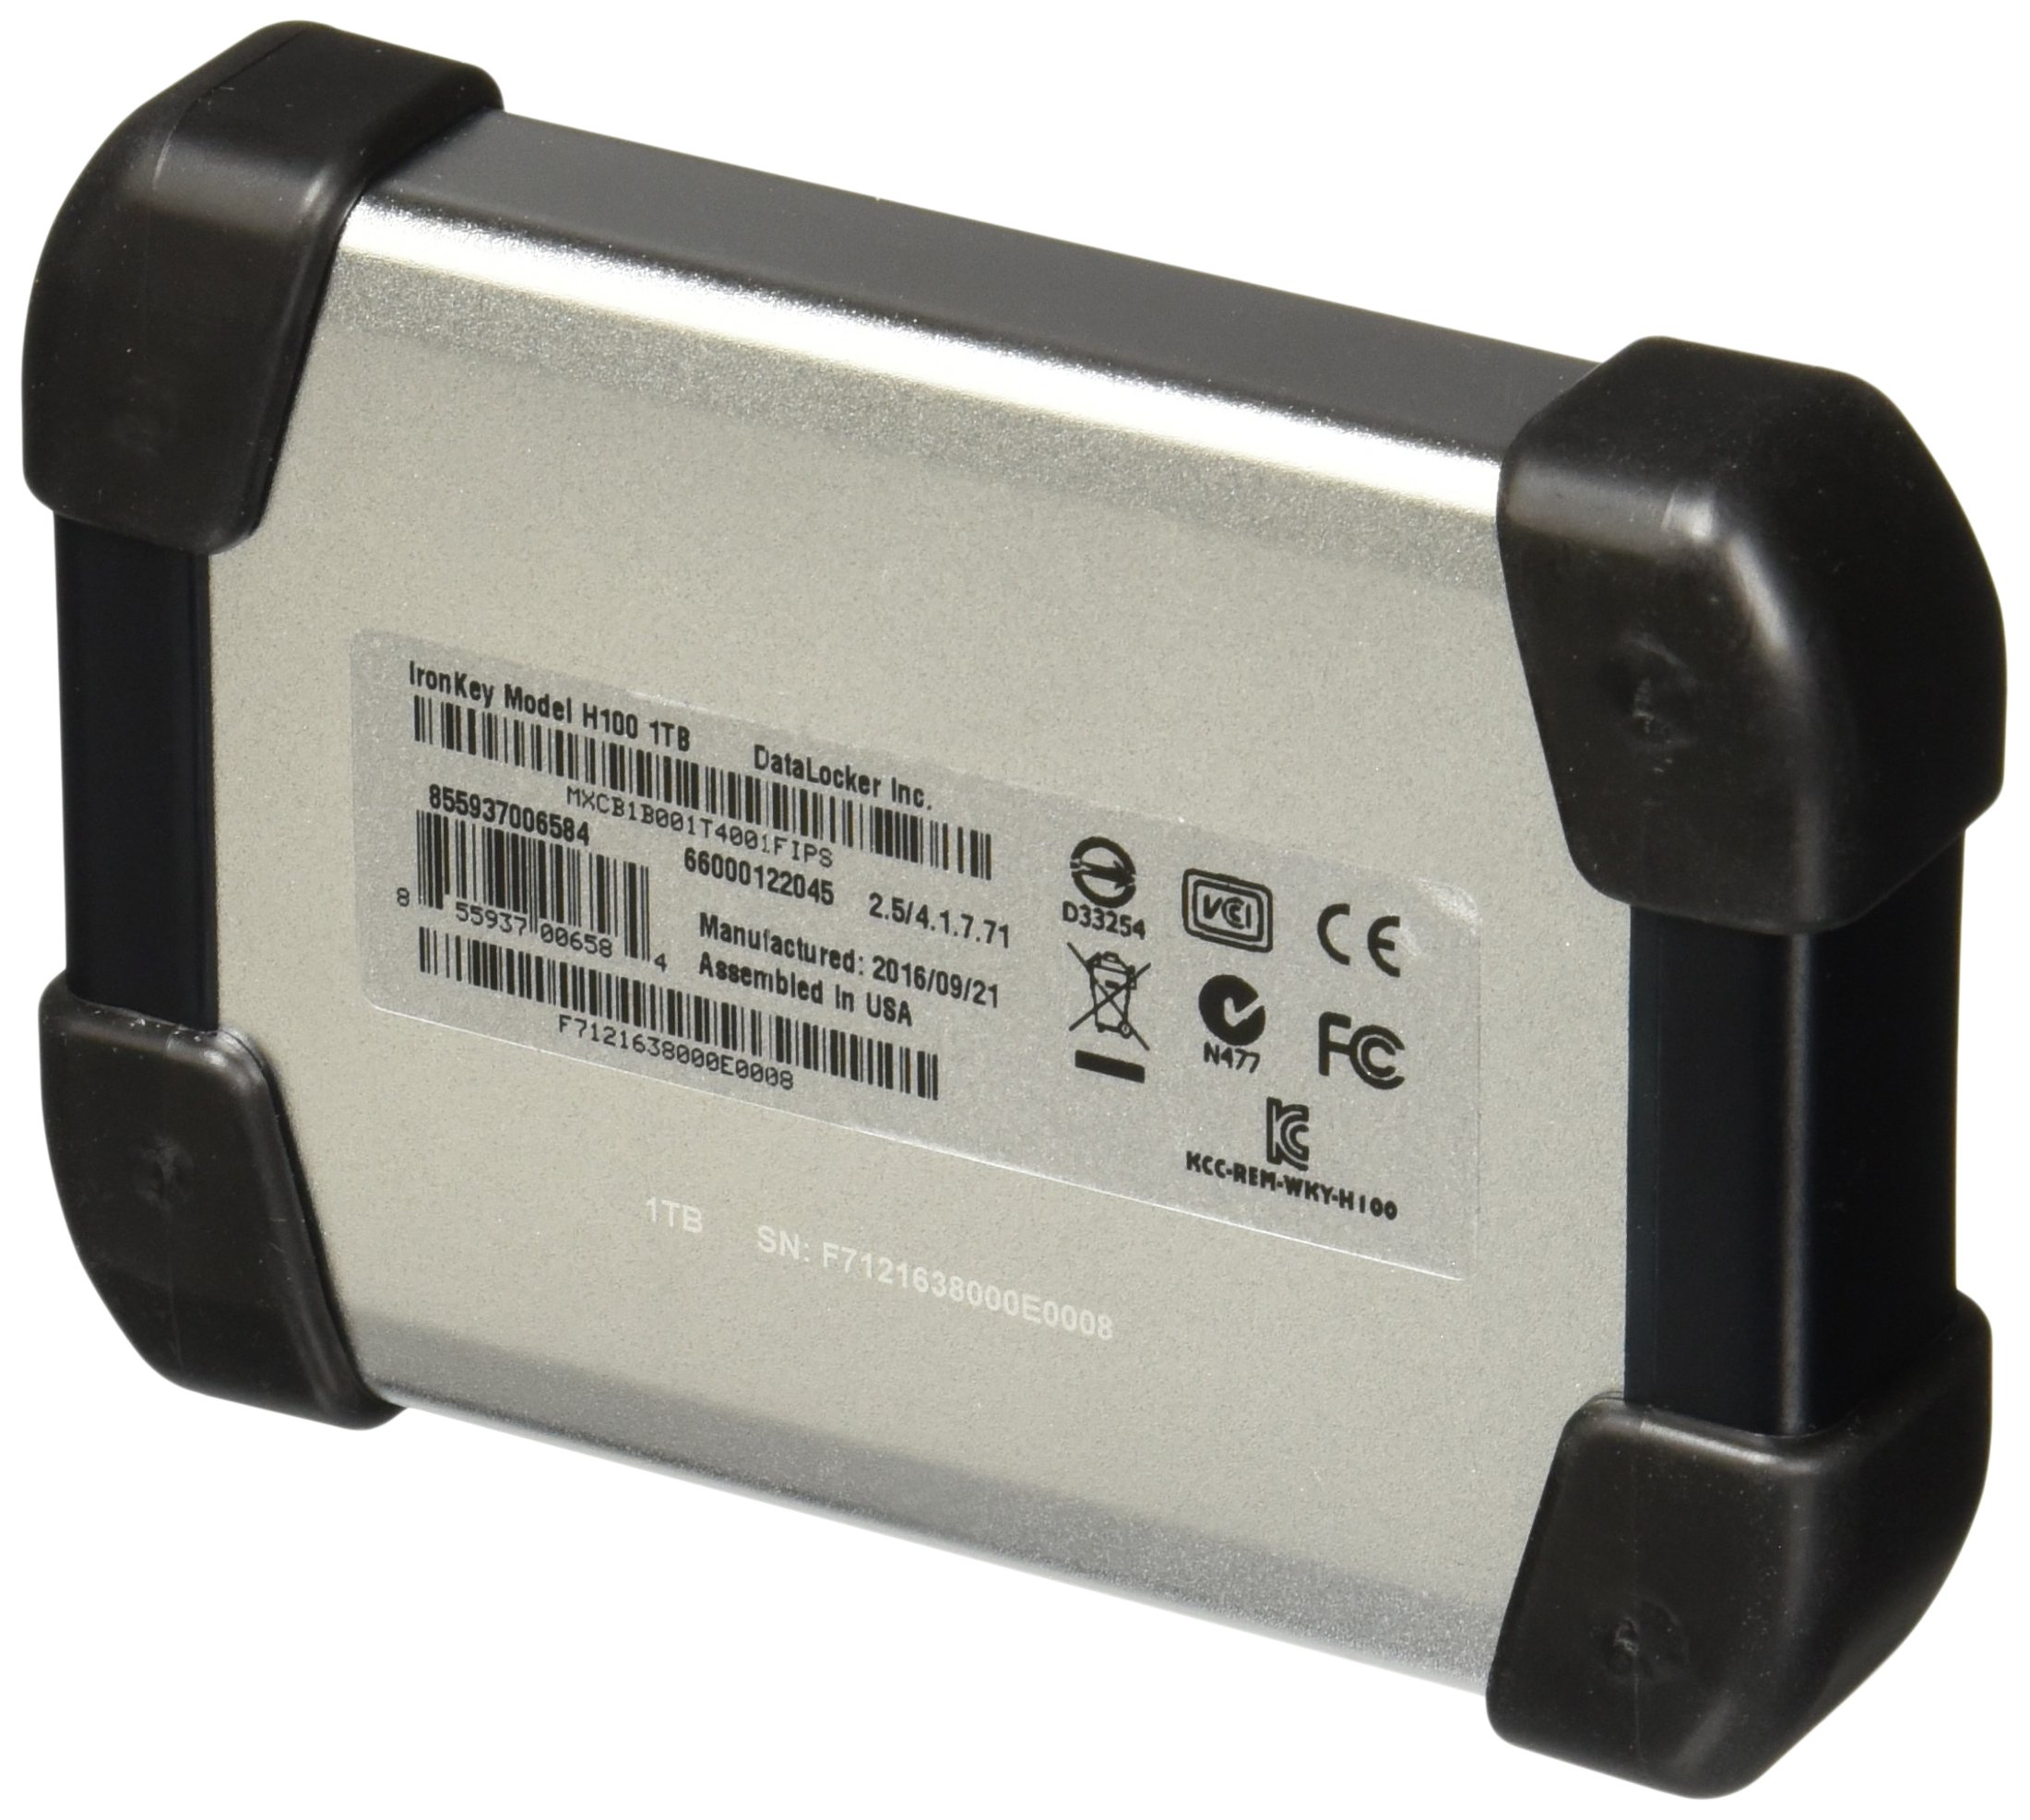 IronKey Defender H100 2.5 EHDD 1.0TB (MXCB1B001T4001FIPS) by IronKey (Image #2)